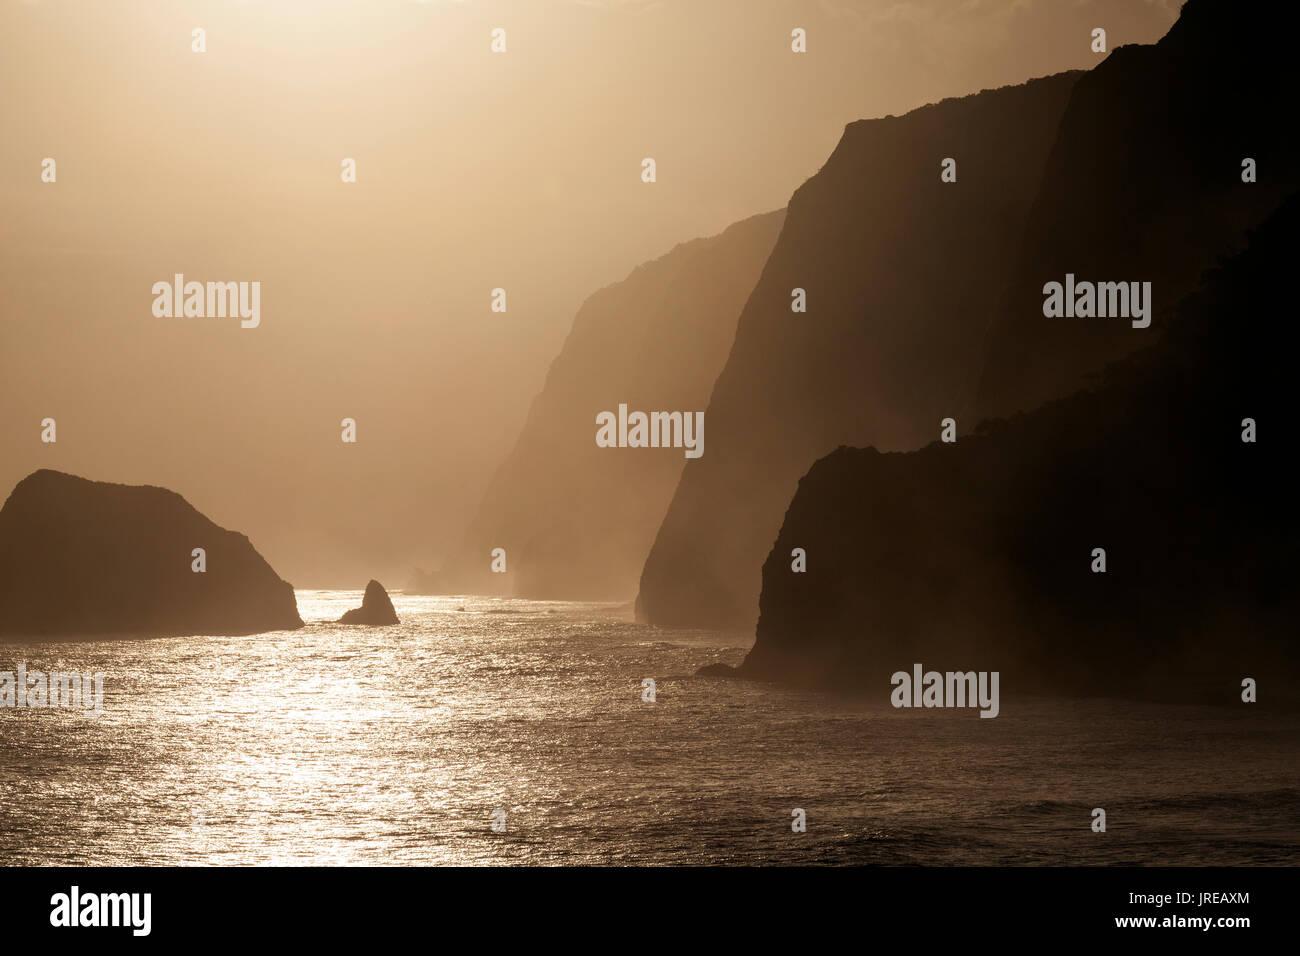 HI00439-00...HAWAI'I - Sunrise over the Pacific Ocean from Pololu Valley-Lookout along the Hamakua Coast of the island of Hawai'i. - Stock Image